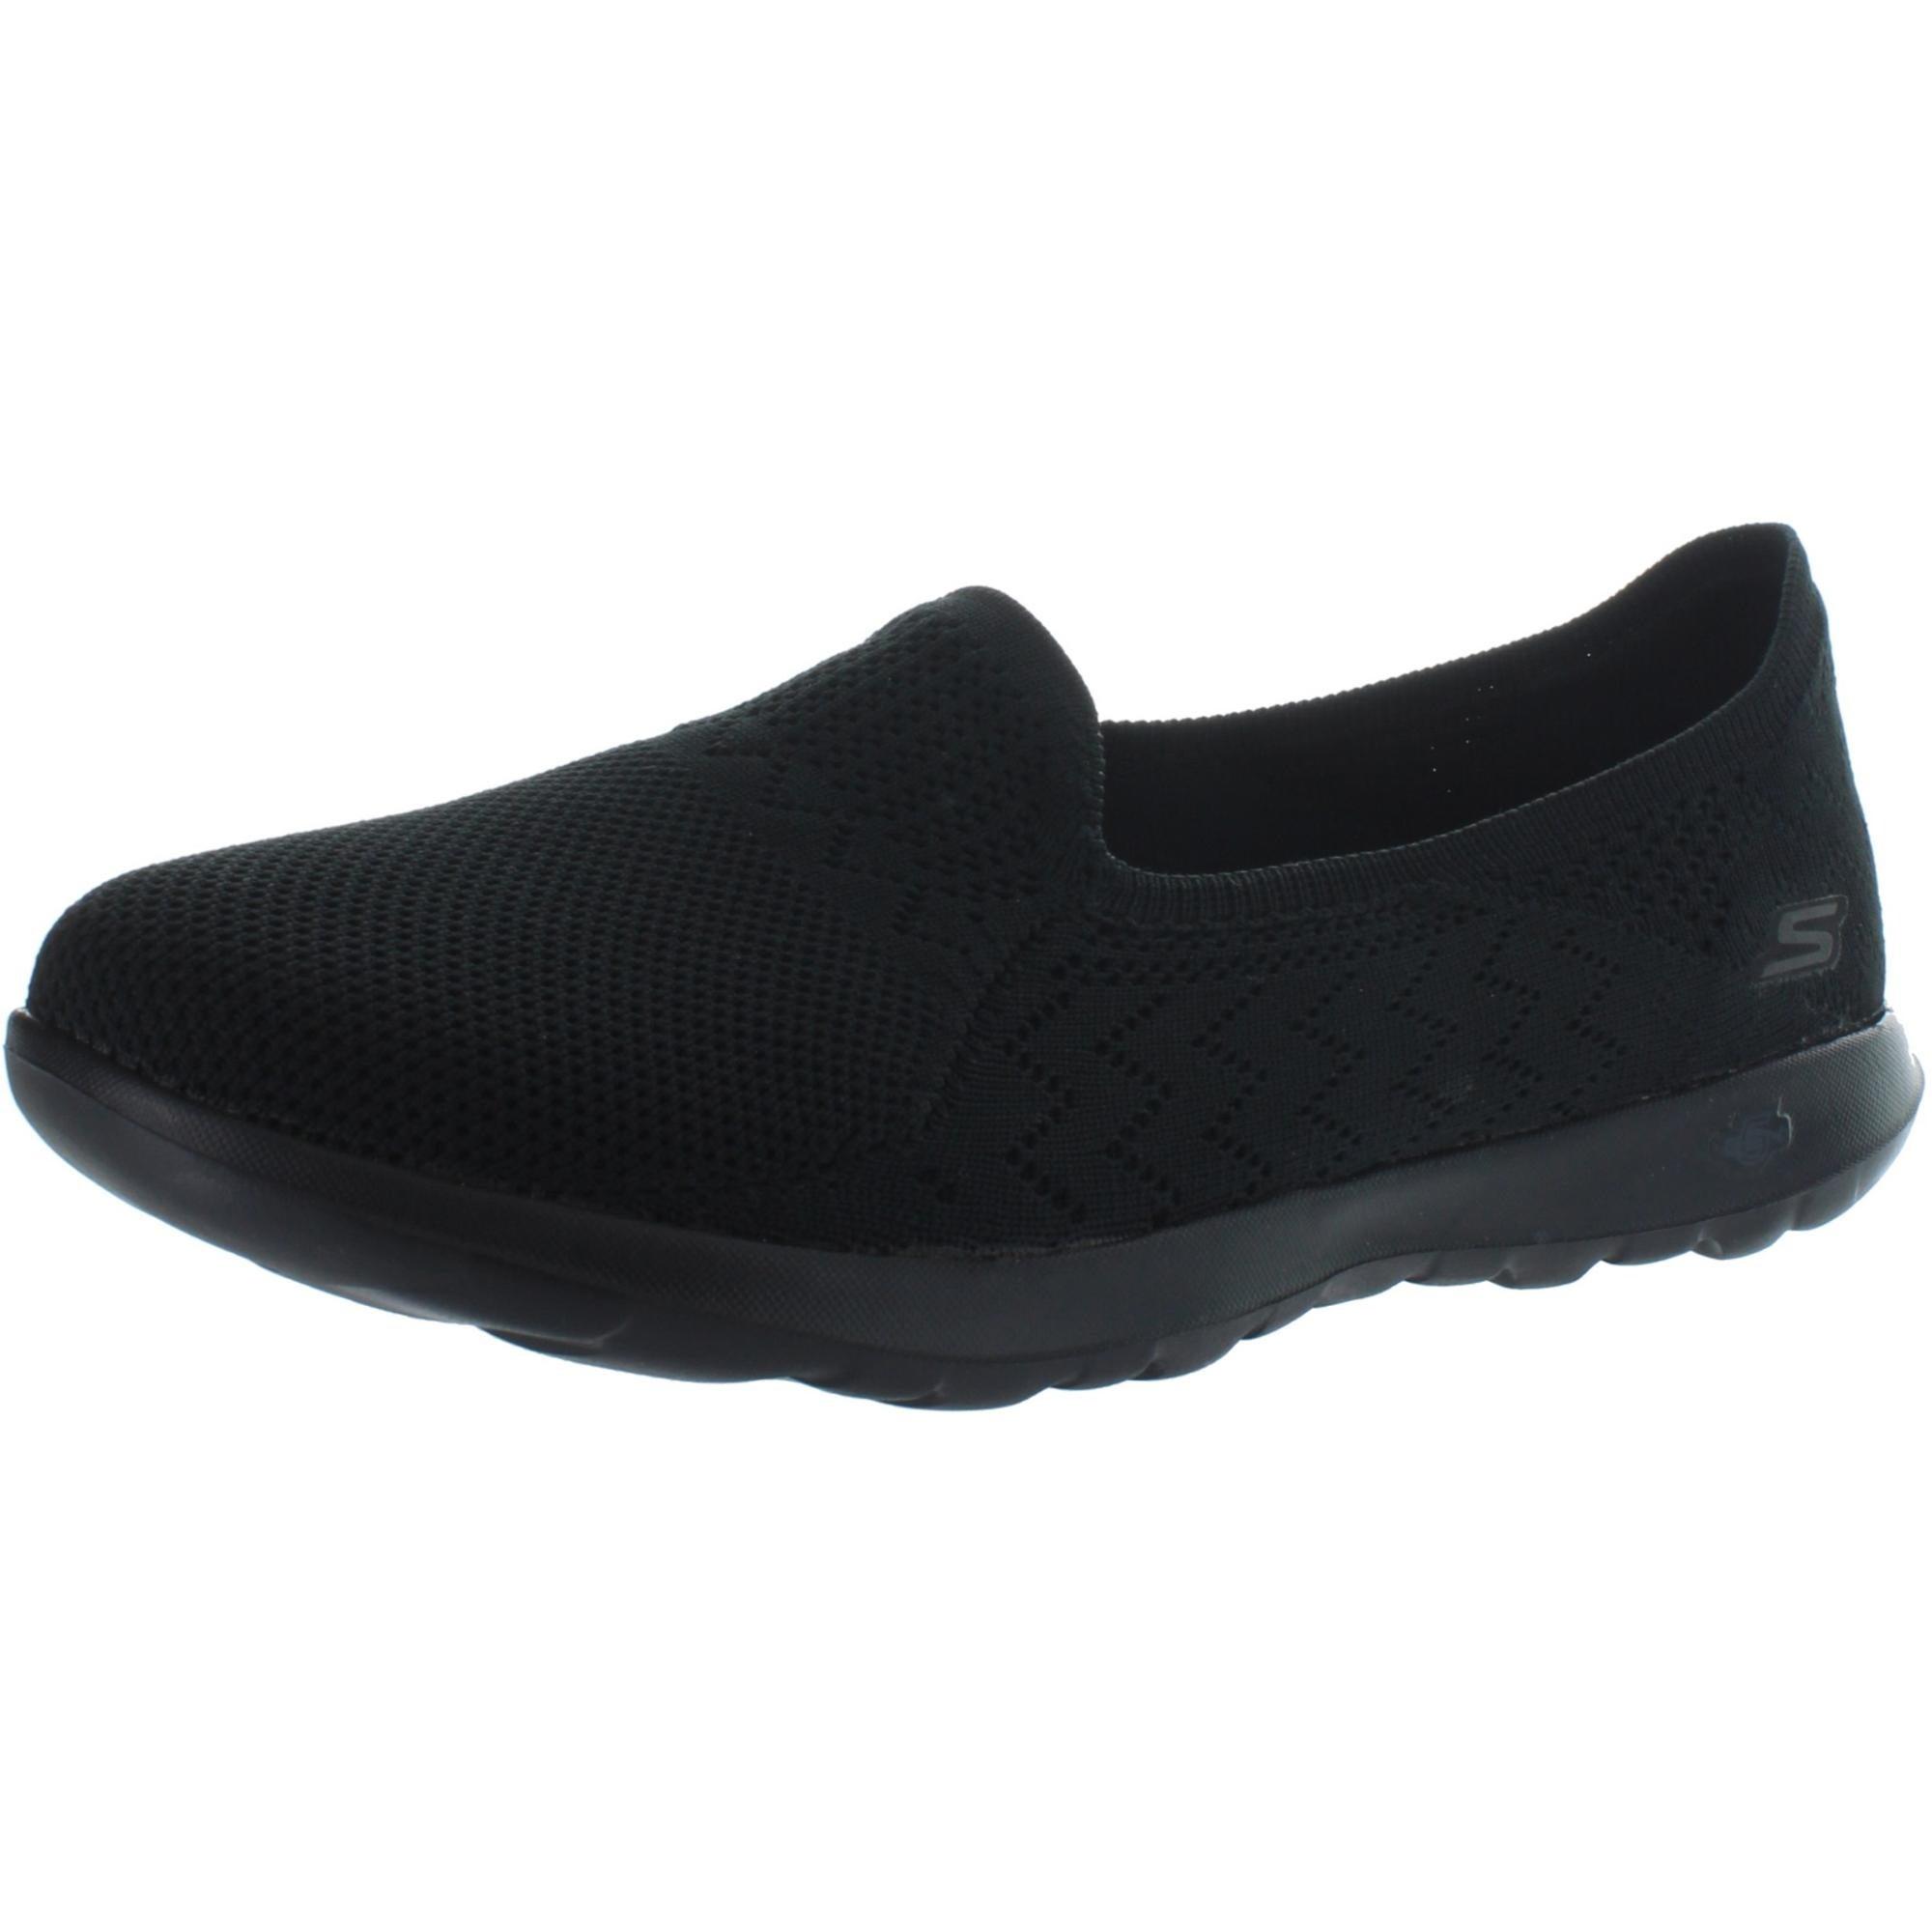 revolución conveniencia Izar  Shop Skechers Womens Ruby Athletic Shoes Lightweight Pull On - Black - 11  Medium (B,M) - Overstock - 31676919